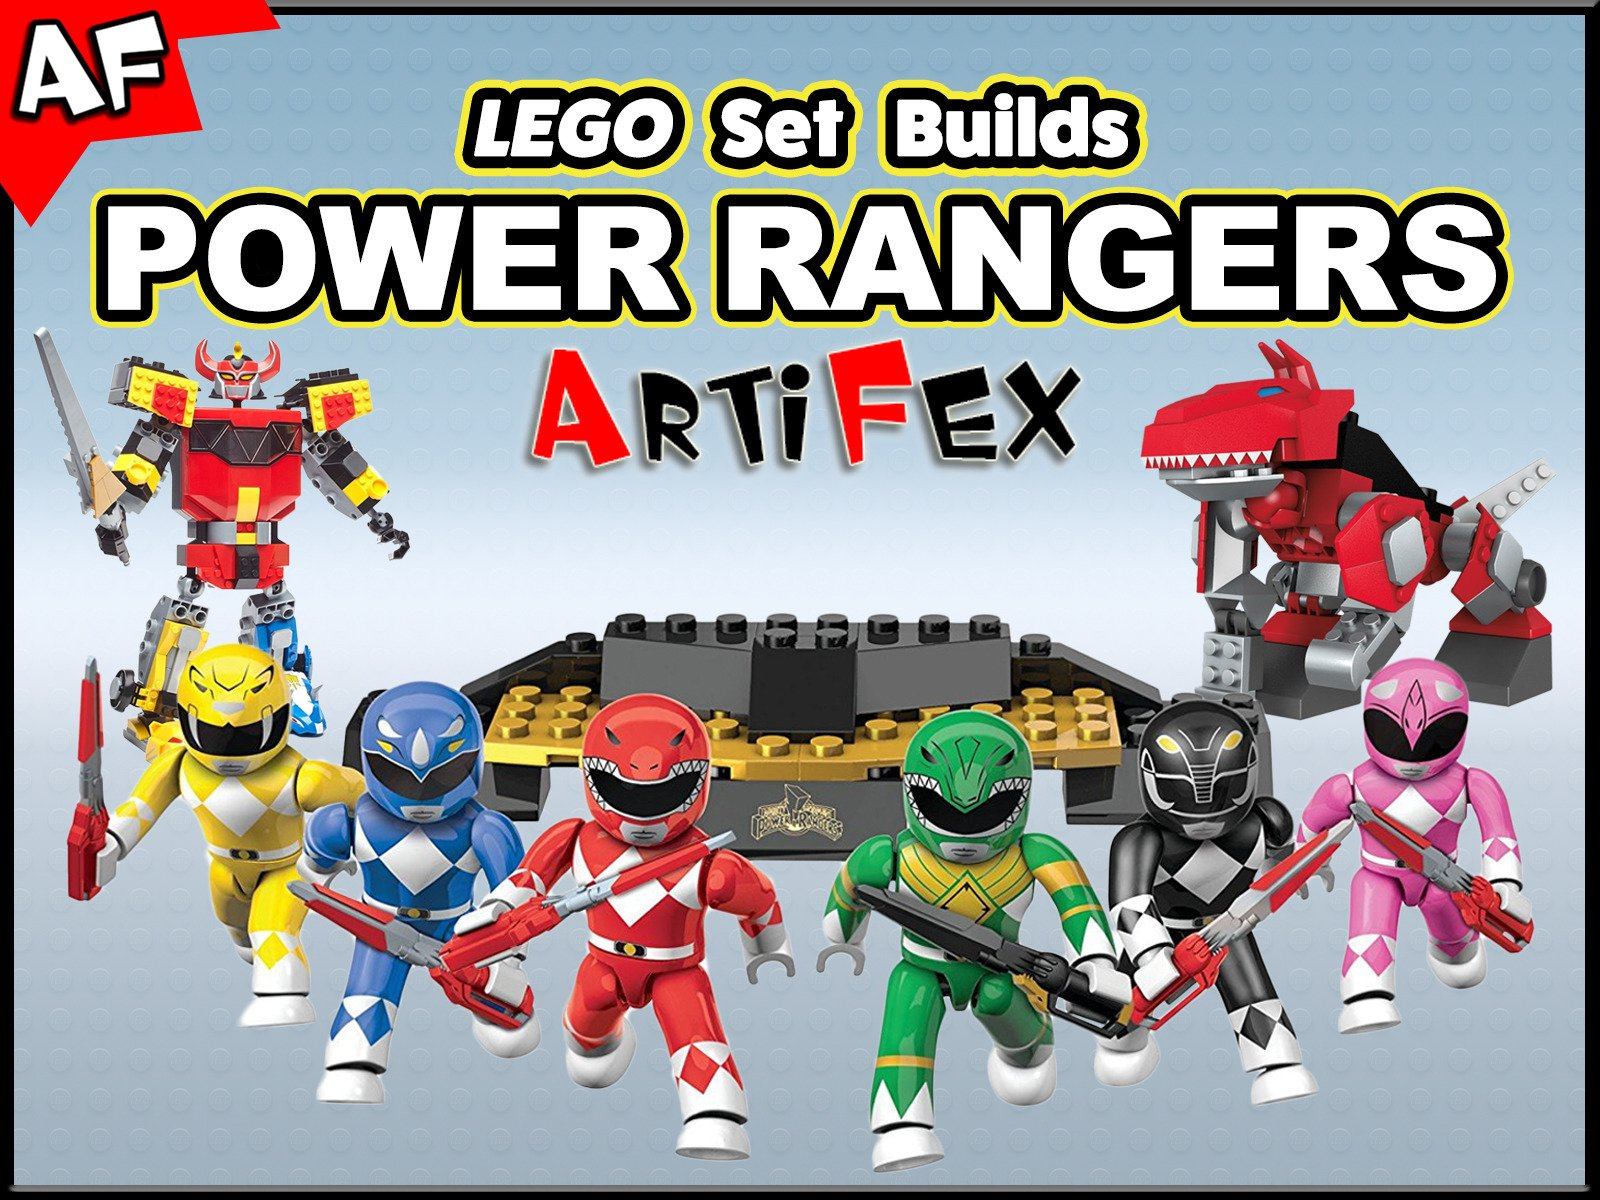 Clip: Lego Set Builds Power Rangers - Season 1